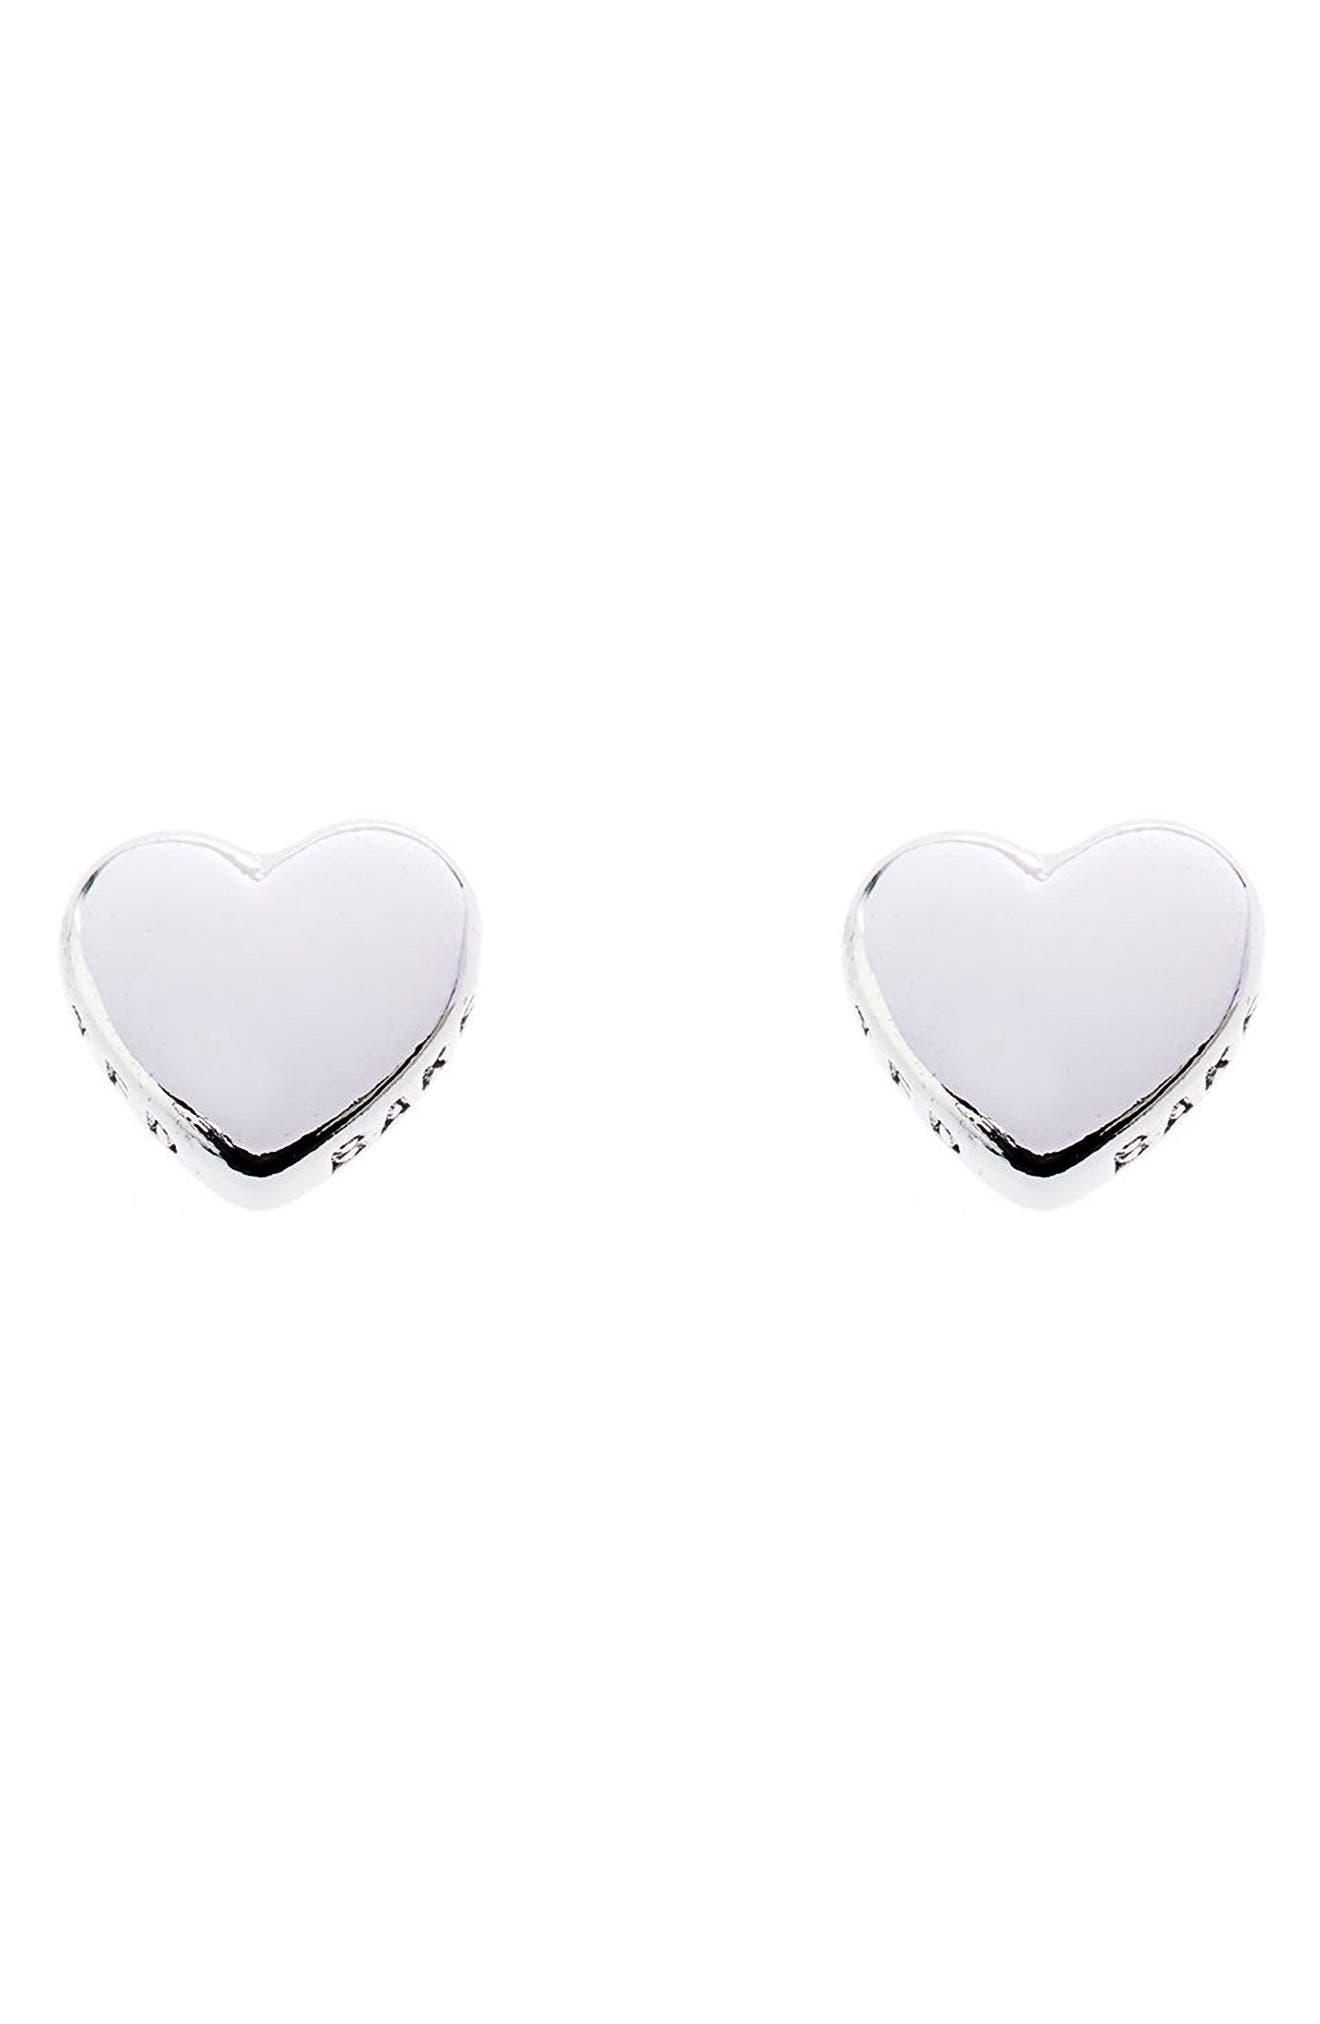 Sweetheart Stud Earrings,                         Main,                         color, 040